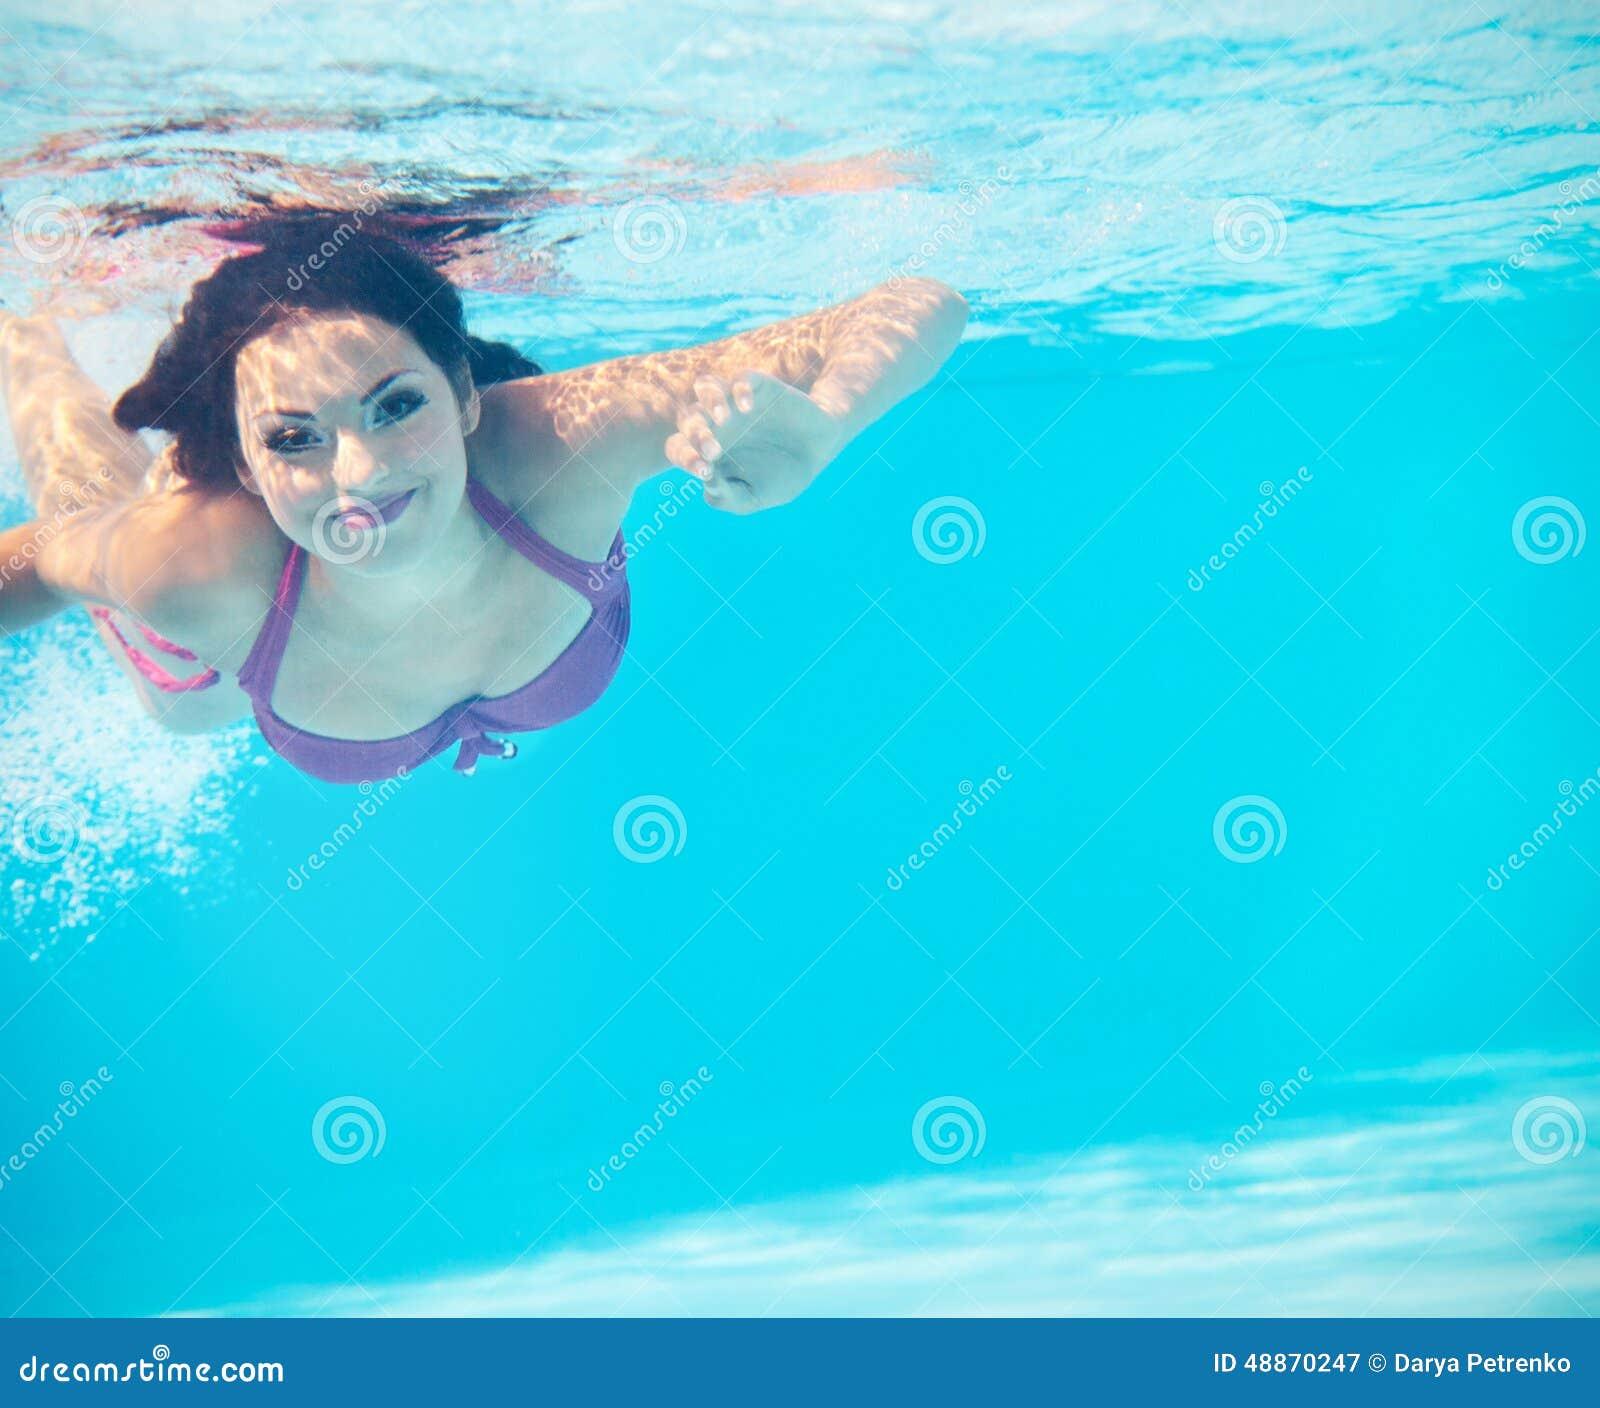 Underwater Woman Portrait In Swimming Pool Stock Photo Image 48870247